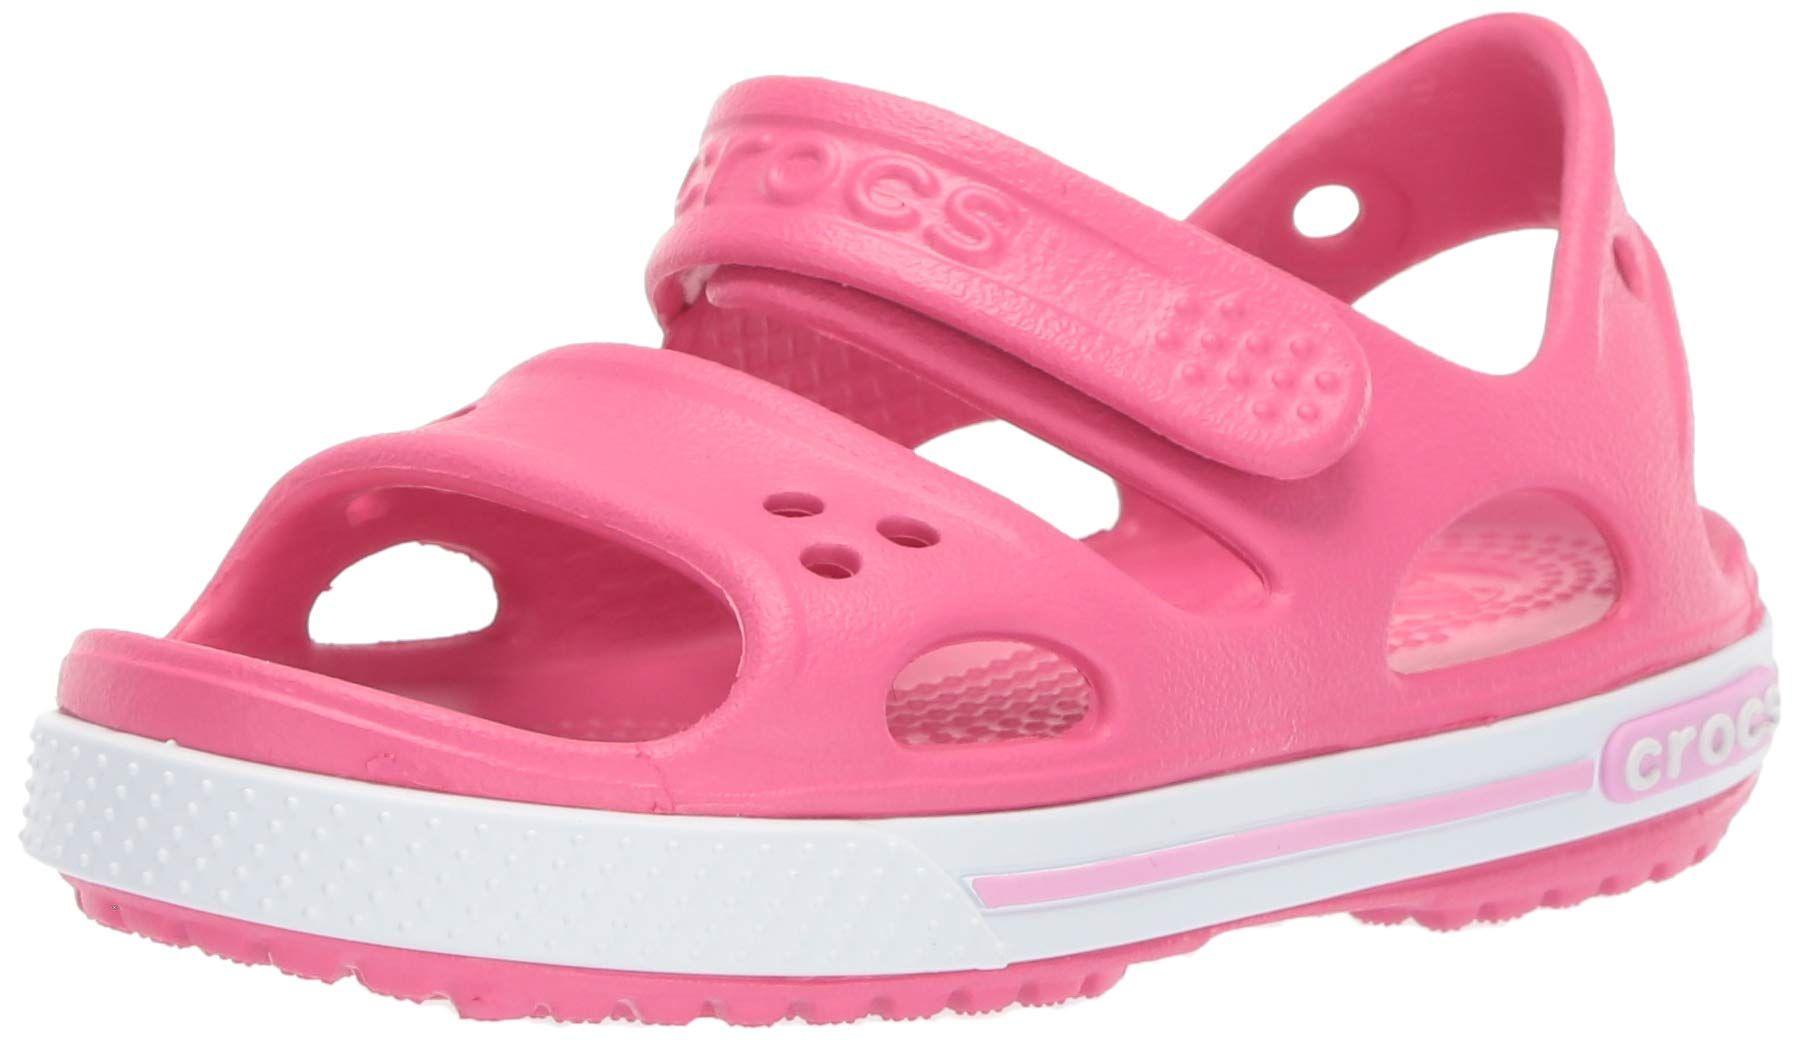 Crocs Kids' Crocband II Toddler Sandal